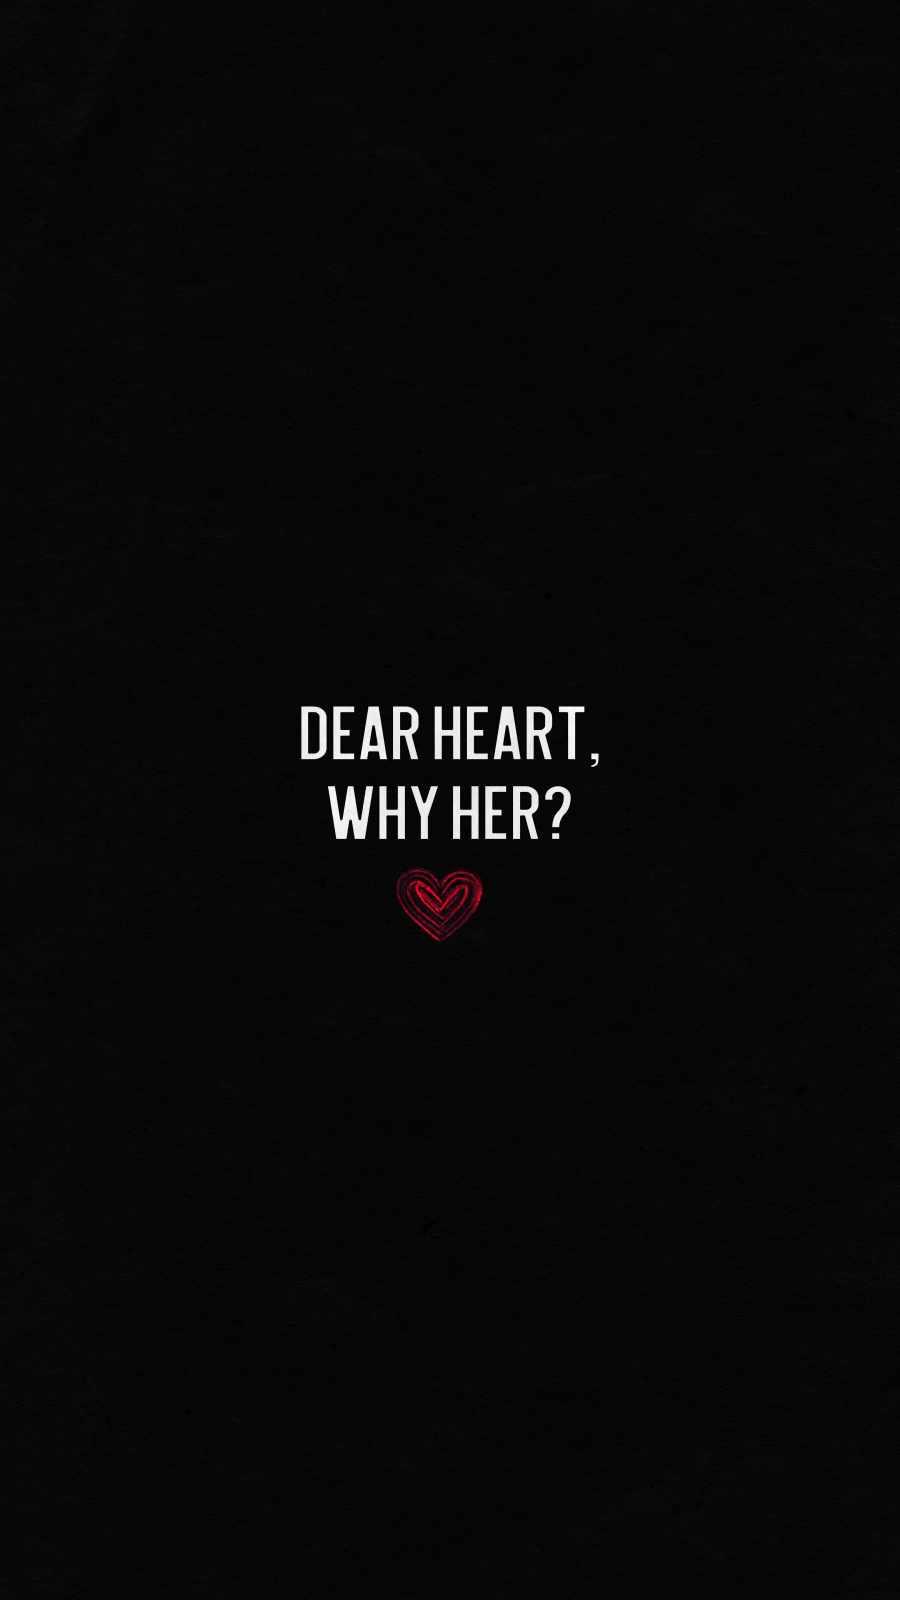 Dear Heart Why Her